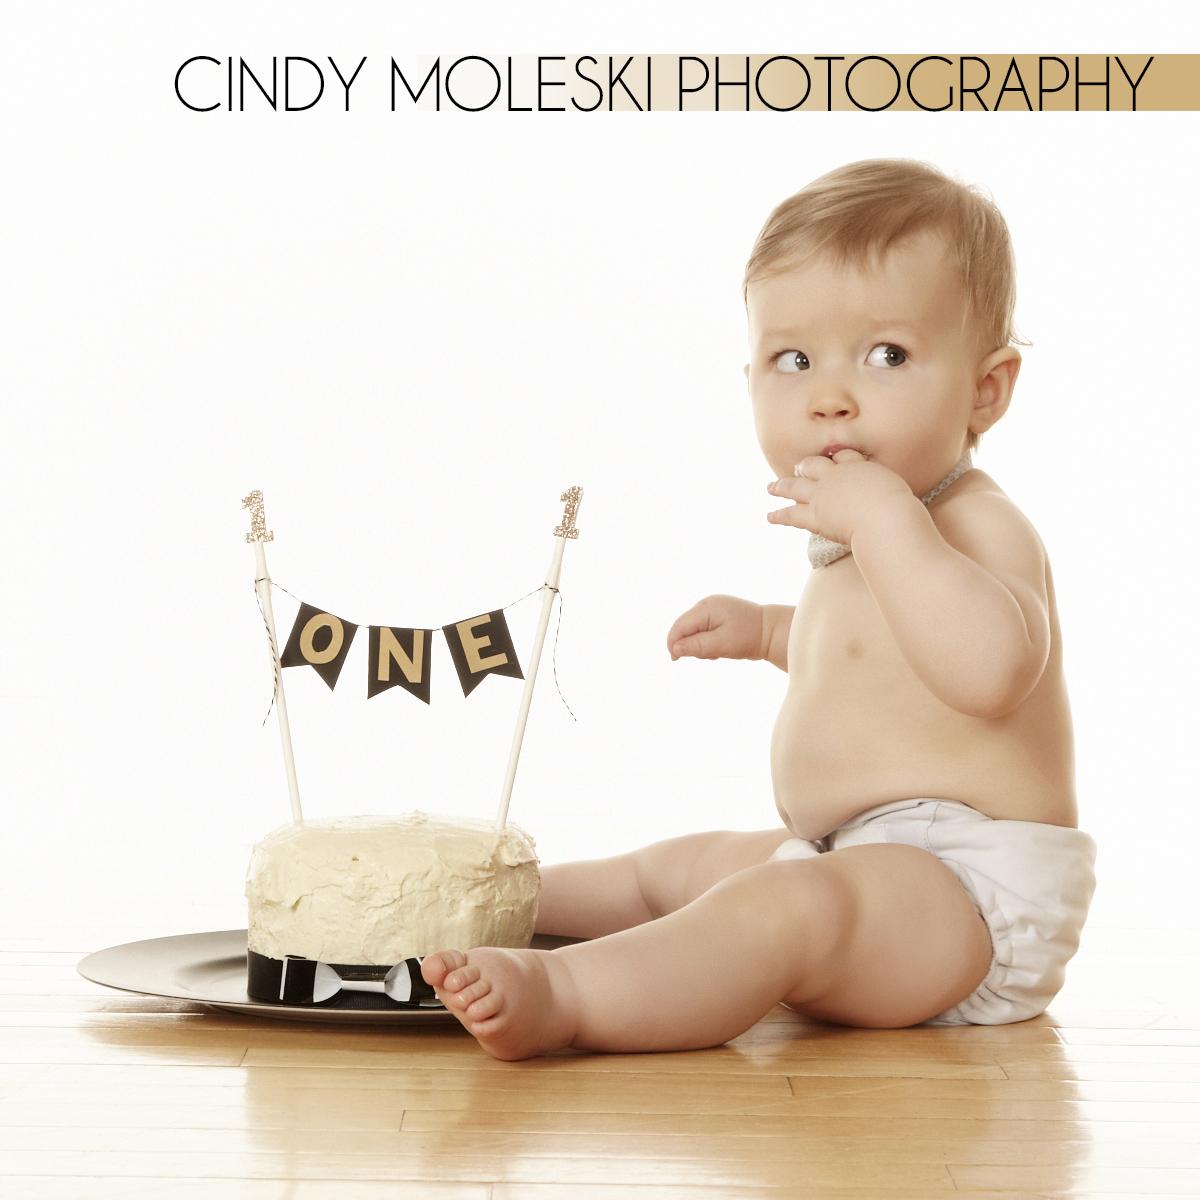 professional-portrait-children-photographer-saskatoon-cindy-moleski-28475-5270FB.jpg